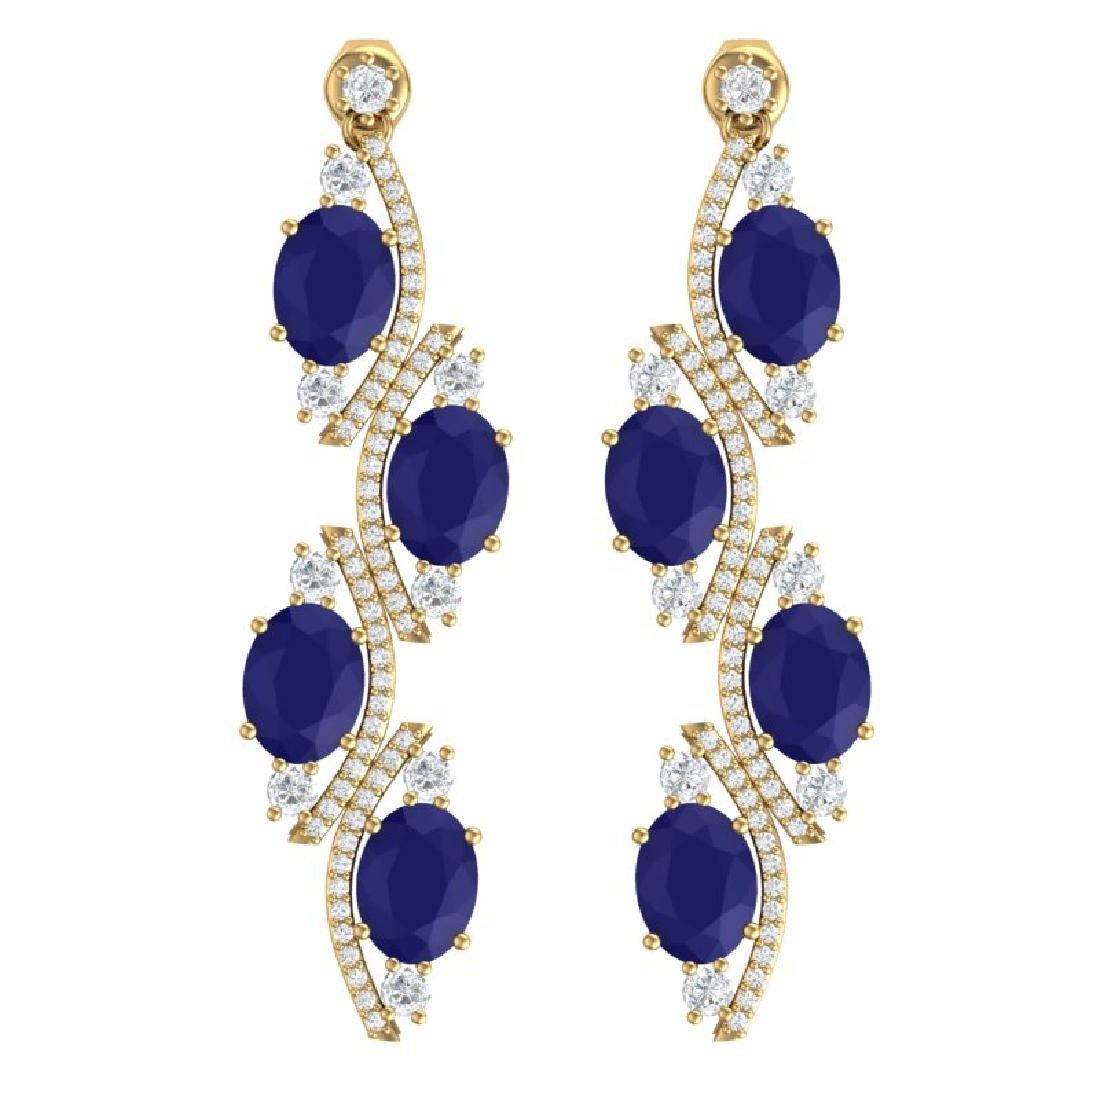 16.12 CTW Royalty Sapphire & VS Diamond Earrings 18K